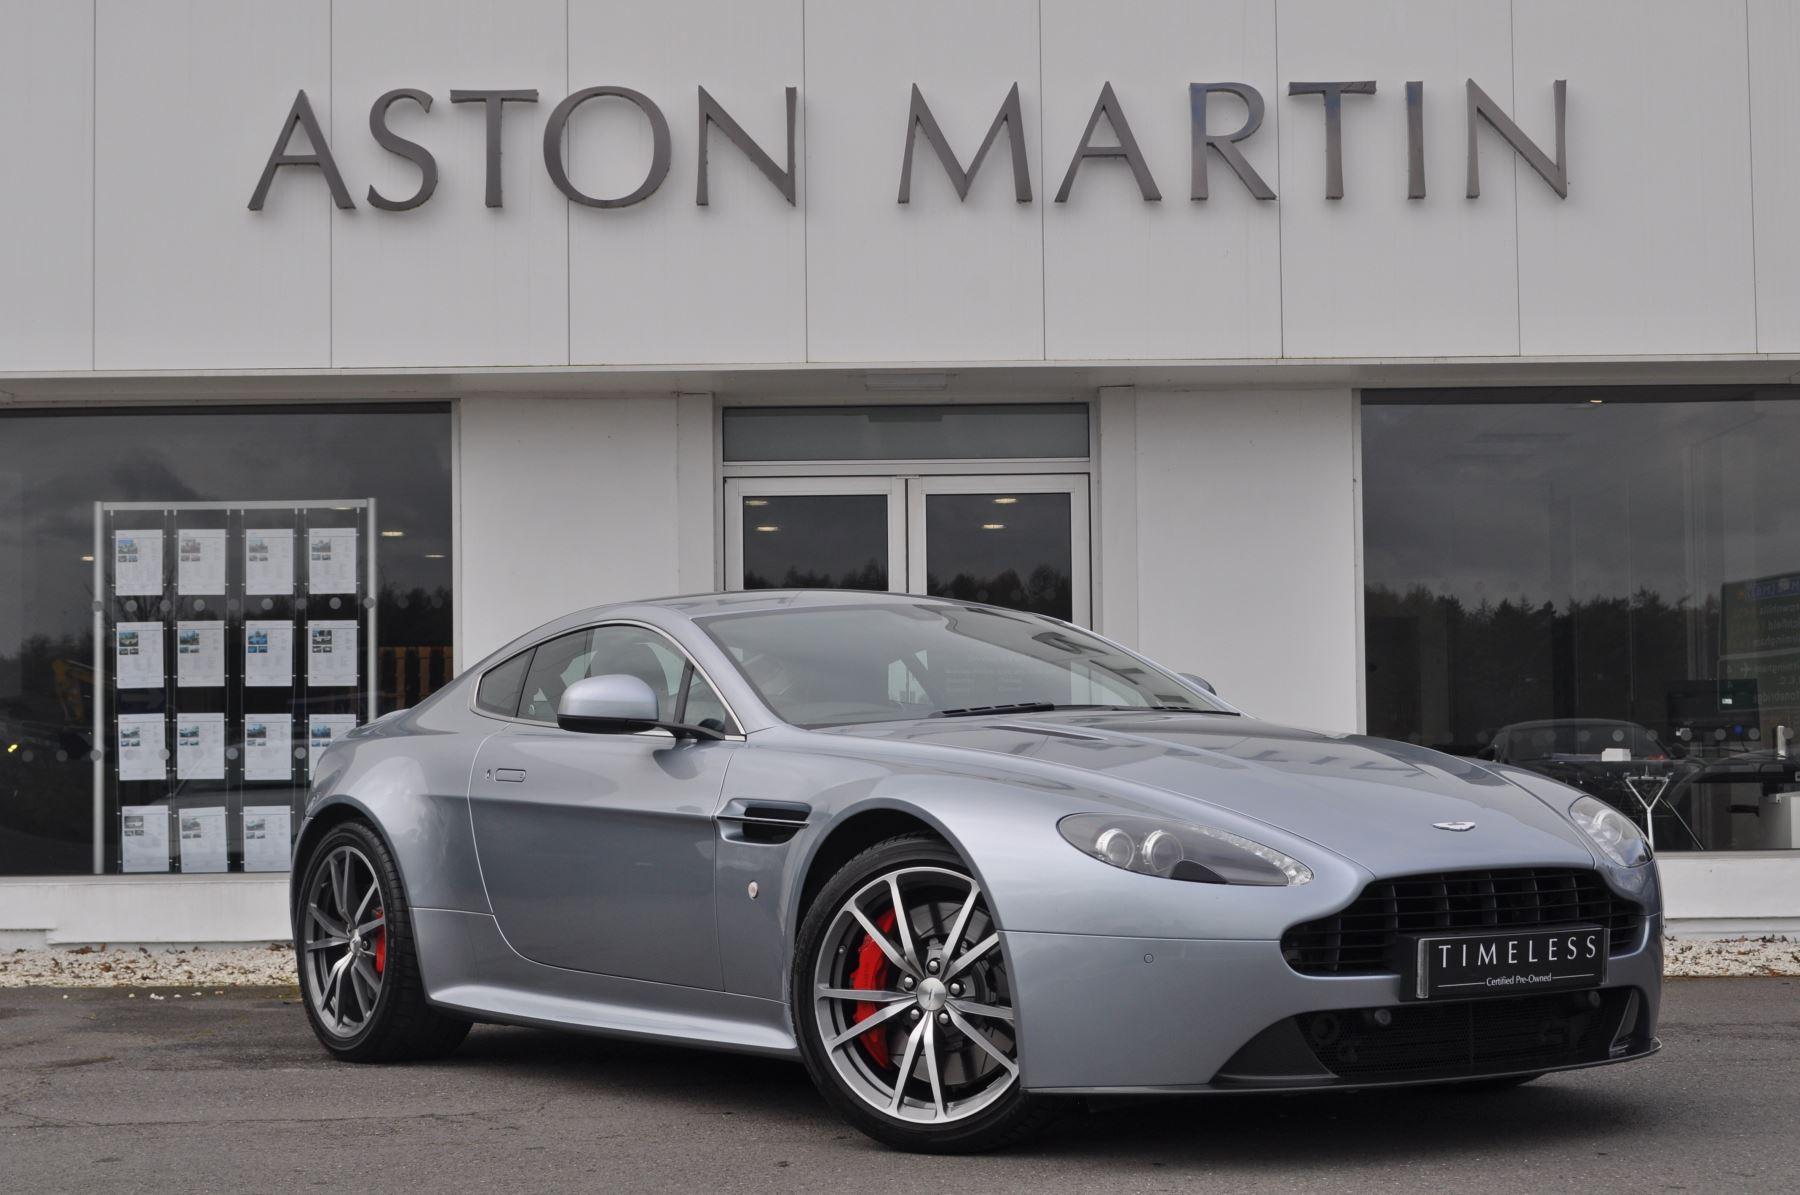 Aston Martin V8 Vantage S Coupe Coupe image 3